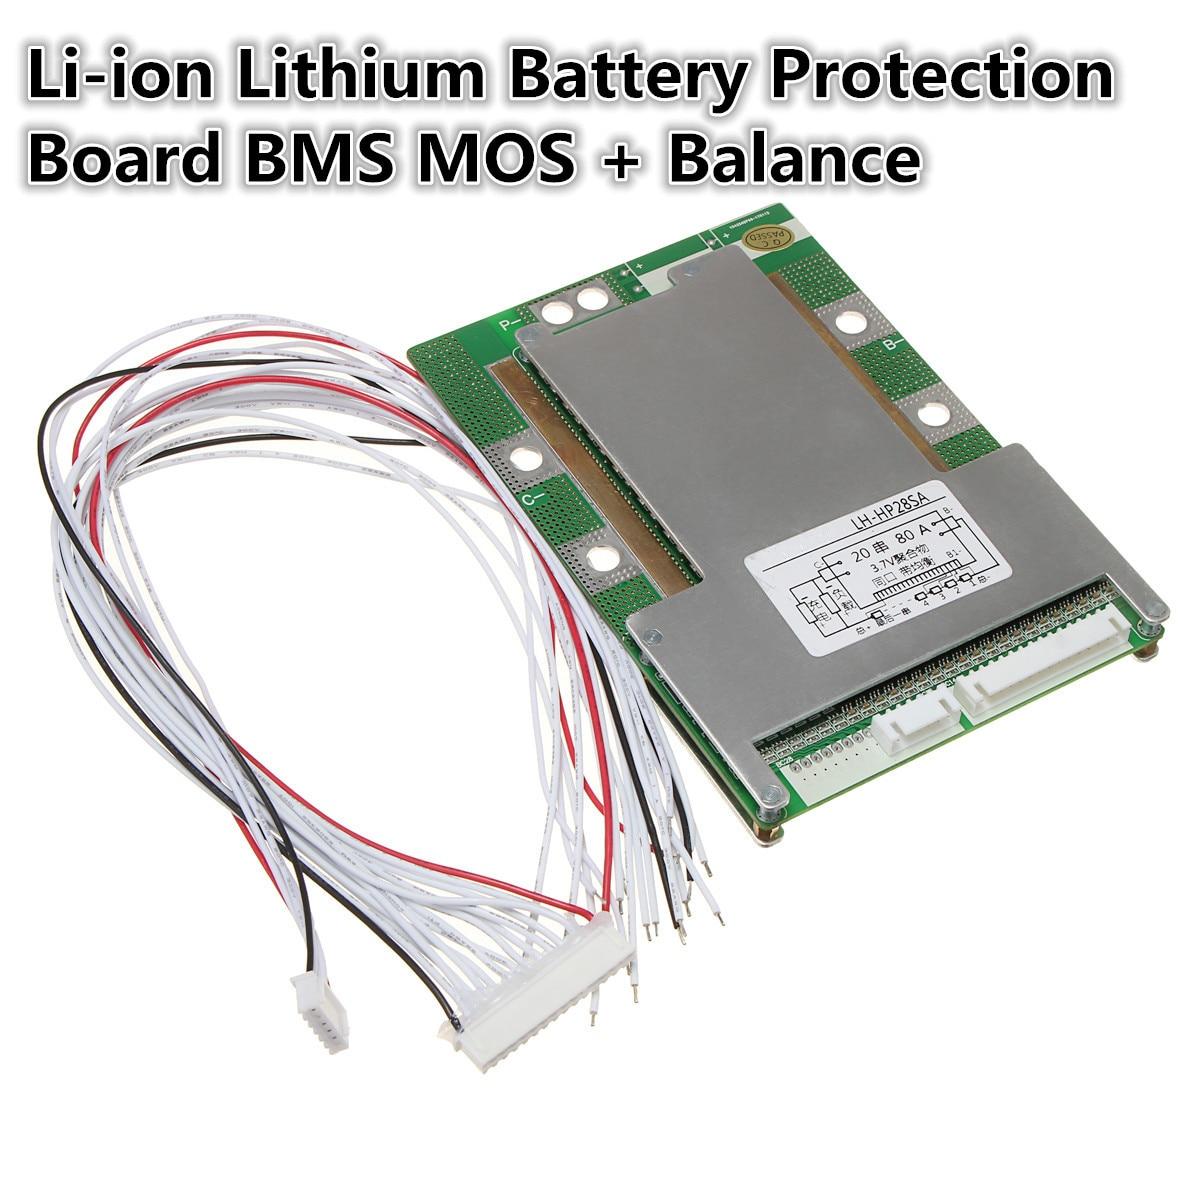 20S 72V(84V) 80A Li-ion Lithium Battery Protection Board BMS MOS with Balance 150*102*15mm20S 72V(84V) 80A Li-ion Lithium Battery Protection Board BMS MOS with Balance 150*102*15mm